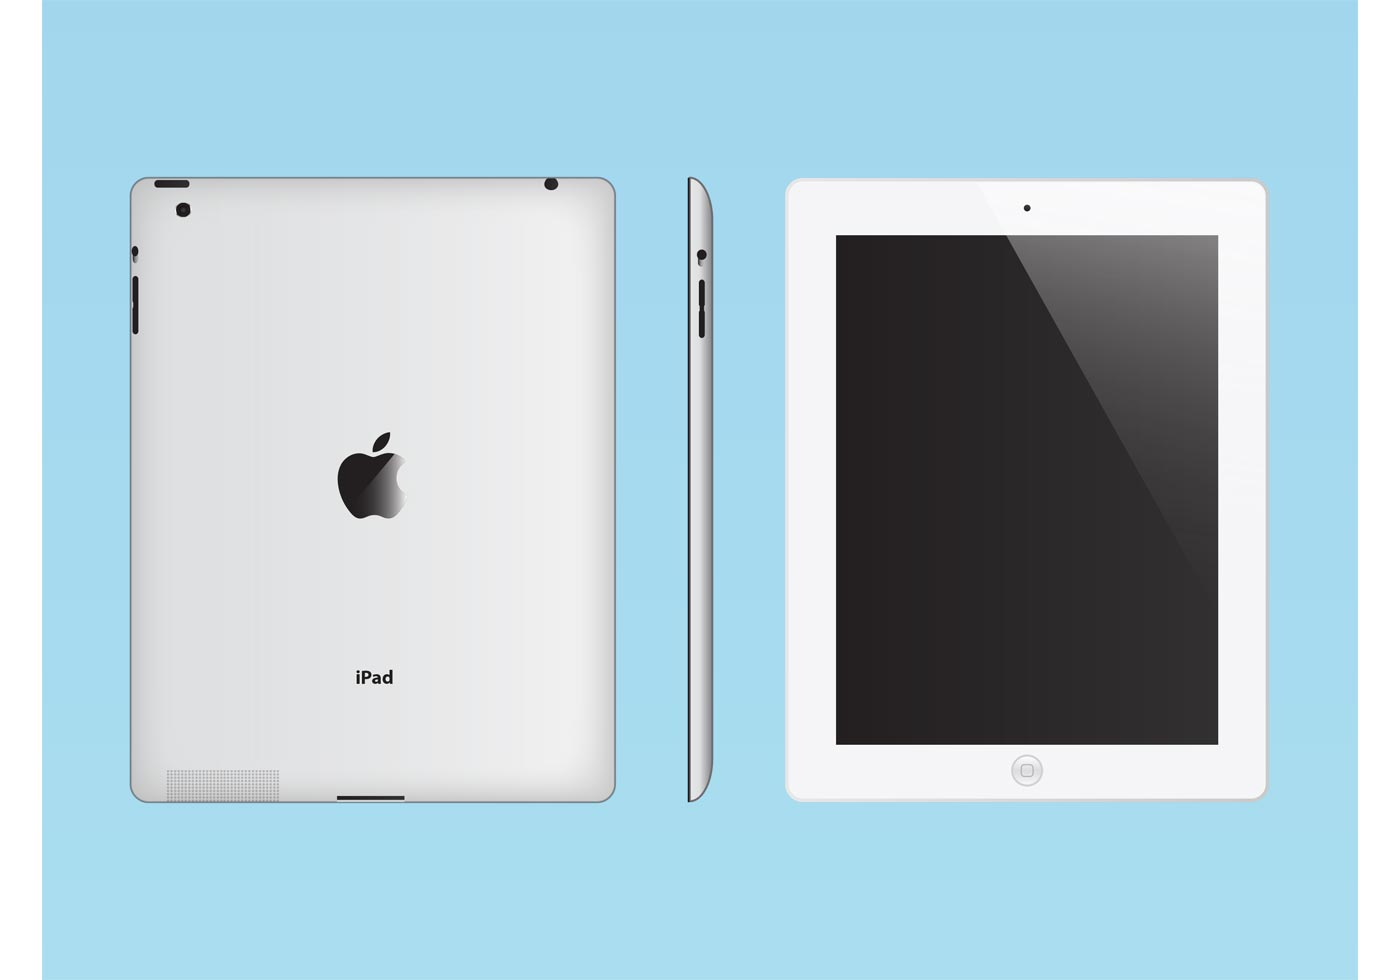 White iPad - Download Free Vectors, Clipart Graphics ...